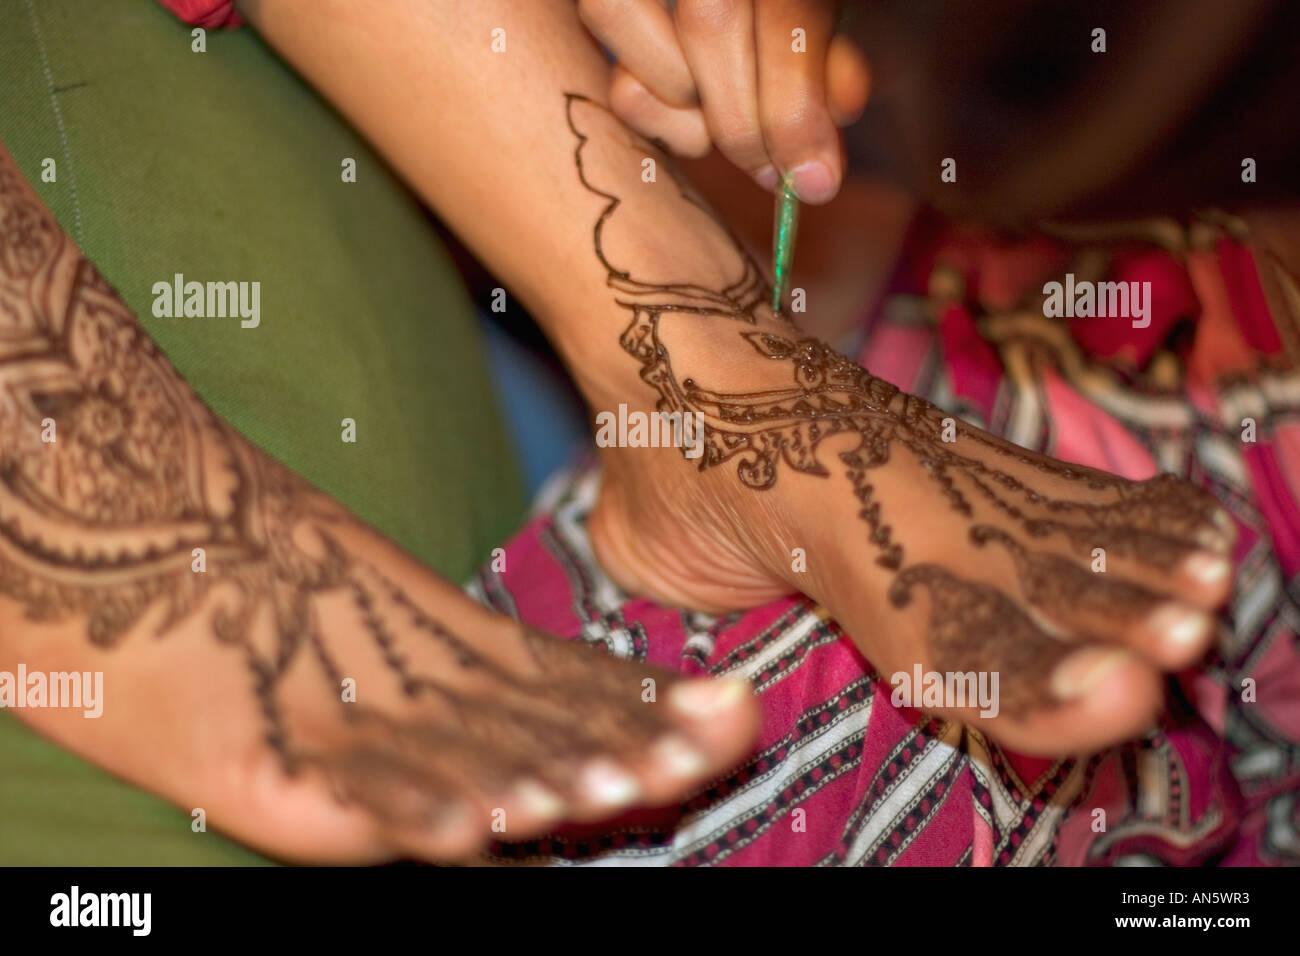 Henna Tattoo Feet Stock Photos Henna Tattoo Feet Stock Images Alamy